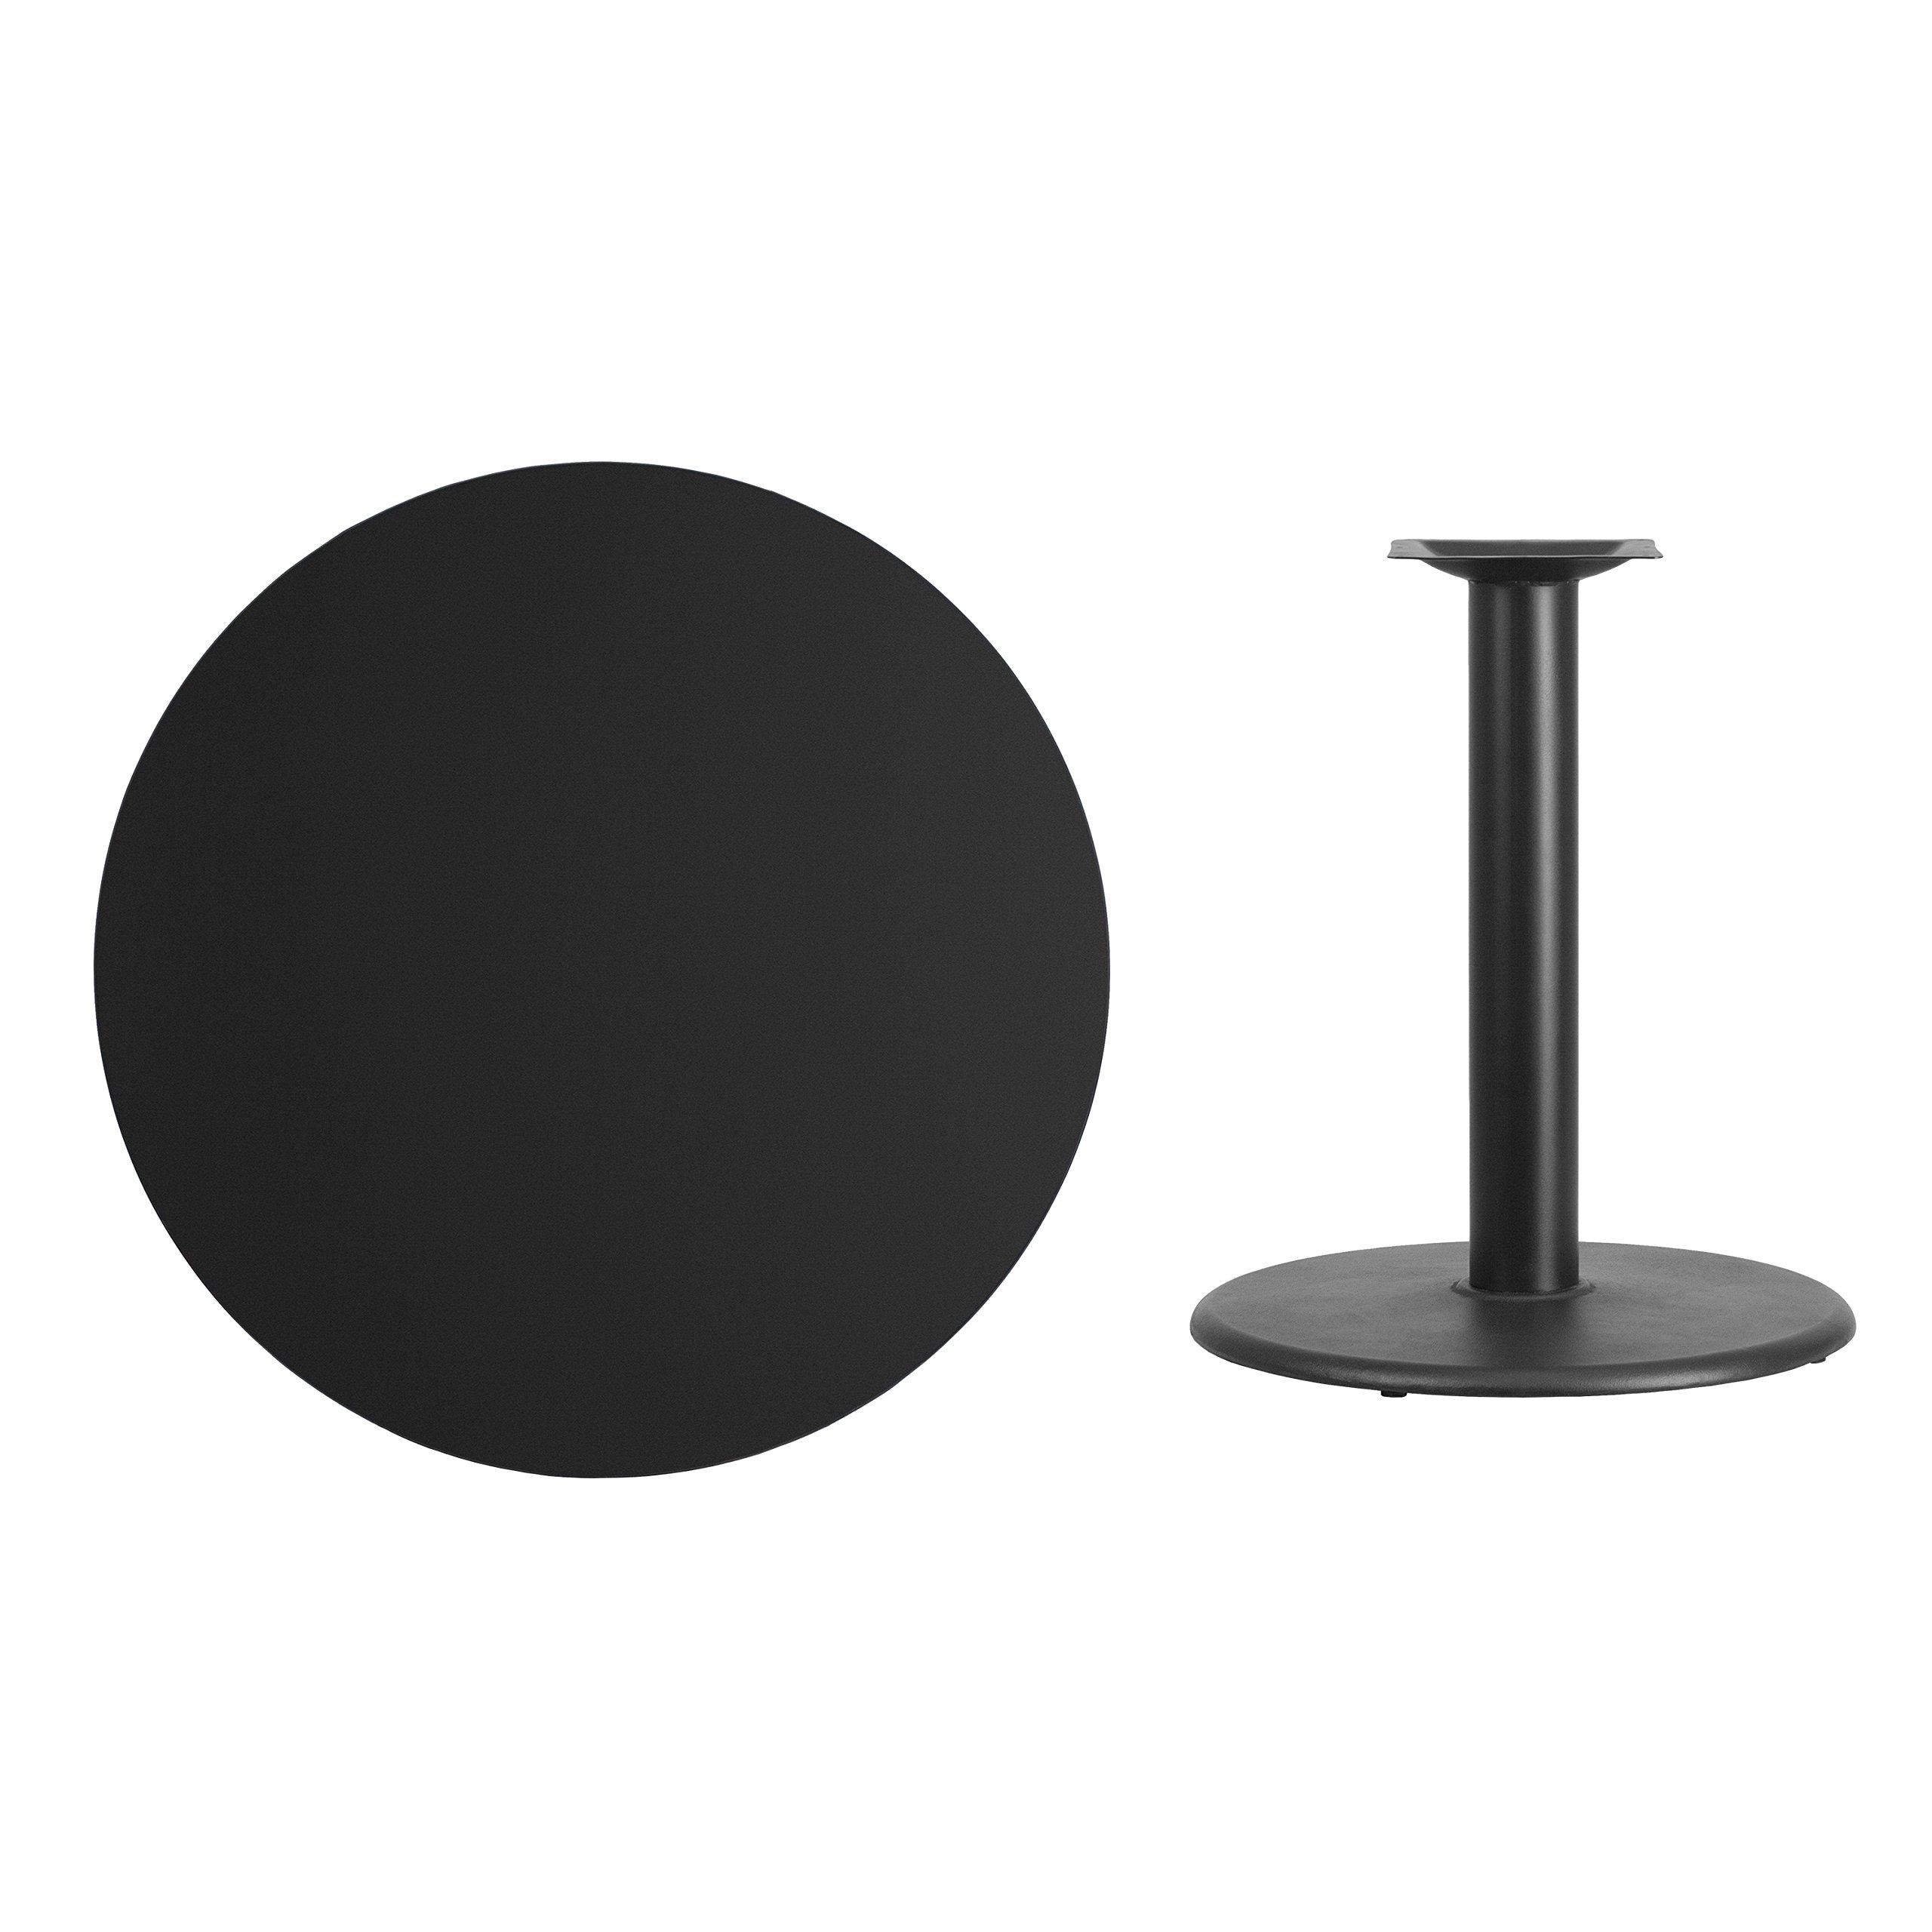 Flash Furniture 36'' Round Black Laminate Table Top with 24'' Round Table Height Base by Flash Furniture